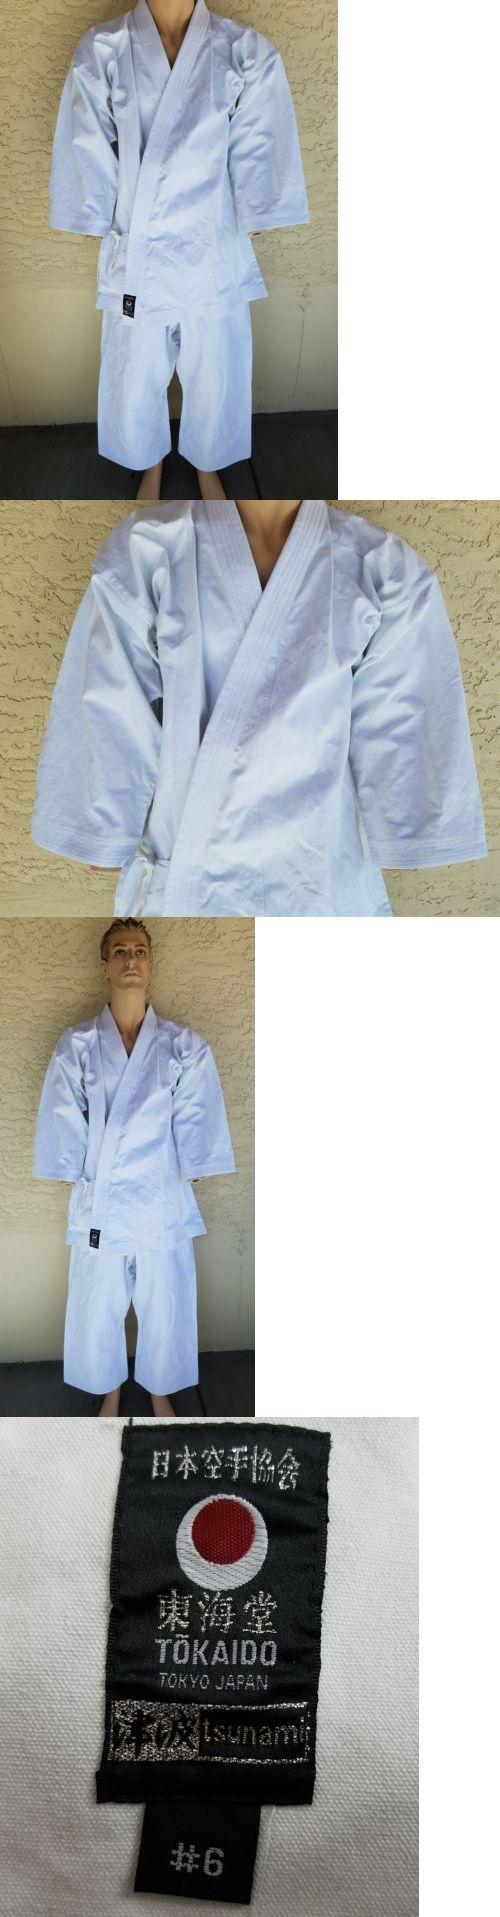 Other Combat Sport Clothing 73988: Tokaido Tsunami Japan Uniform Heavyweight Martial Arts Karate Gi 4+ Lbs Size # 6 -> BUY IT NOW ONLY: $125 on eBay!